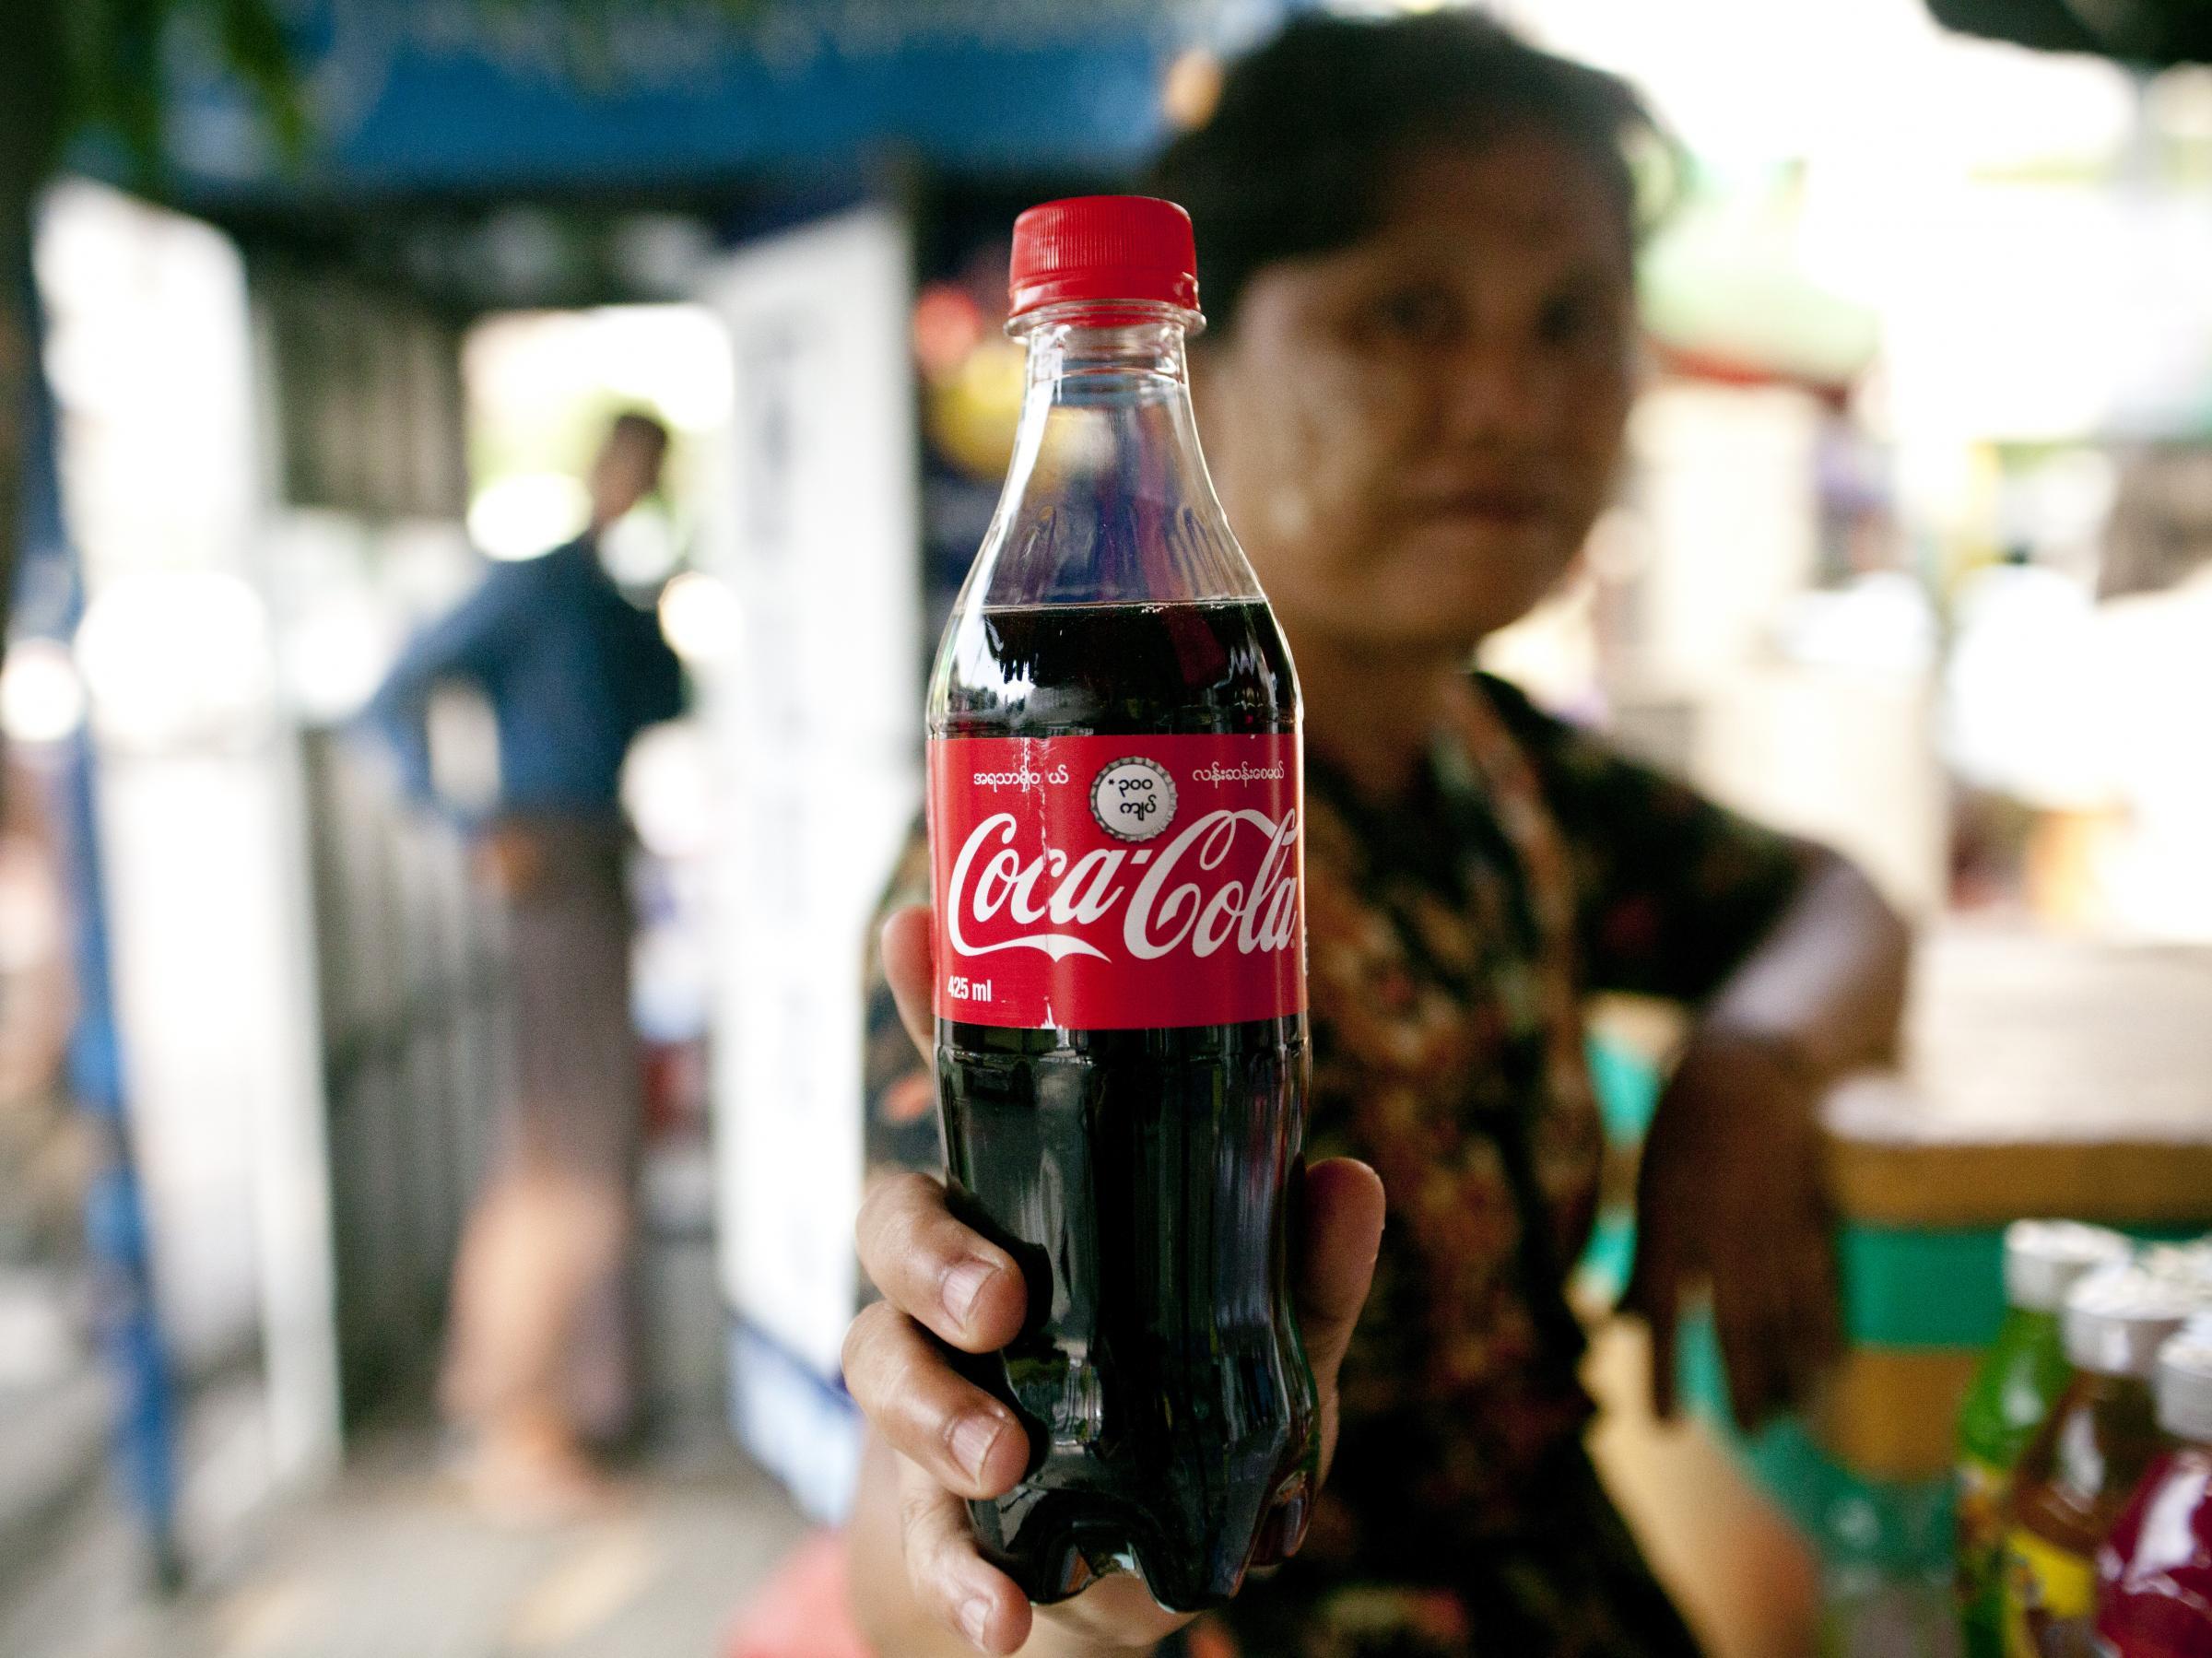 Coca cola back in burma